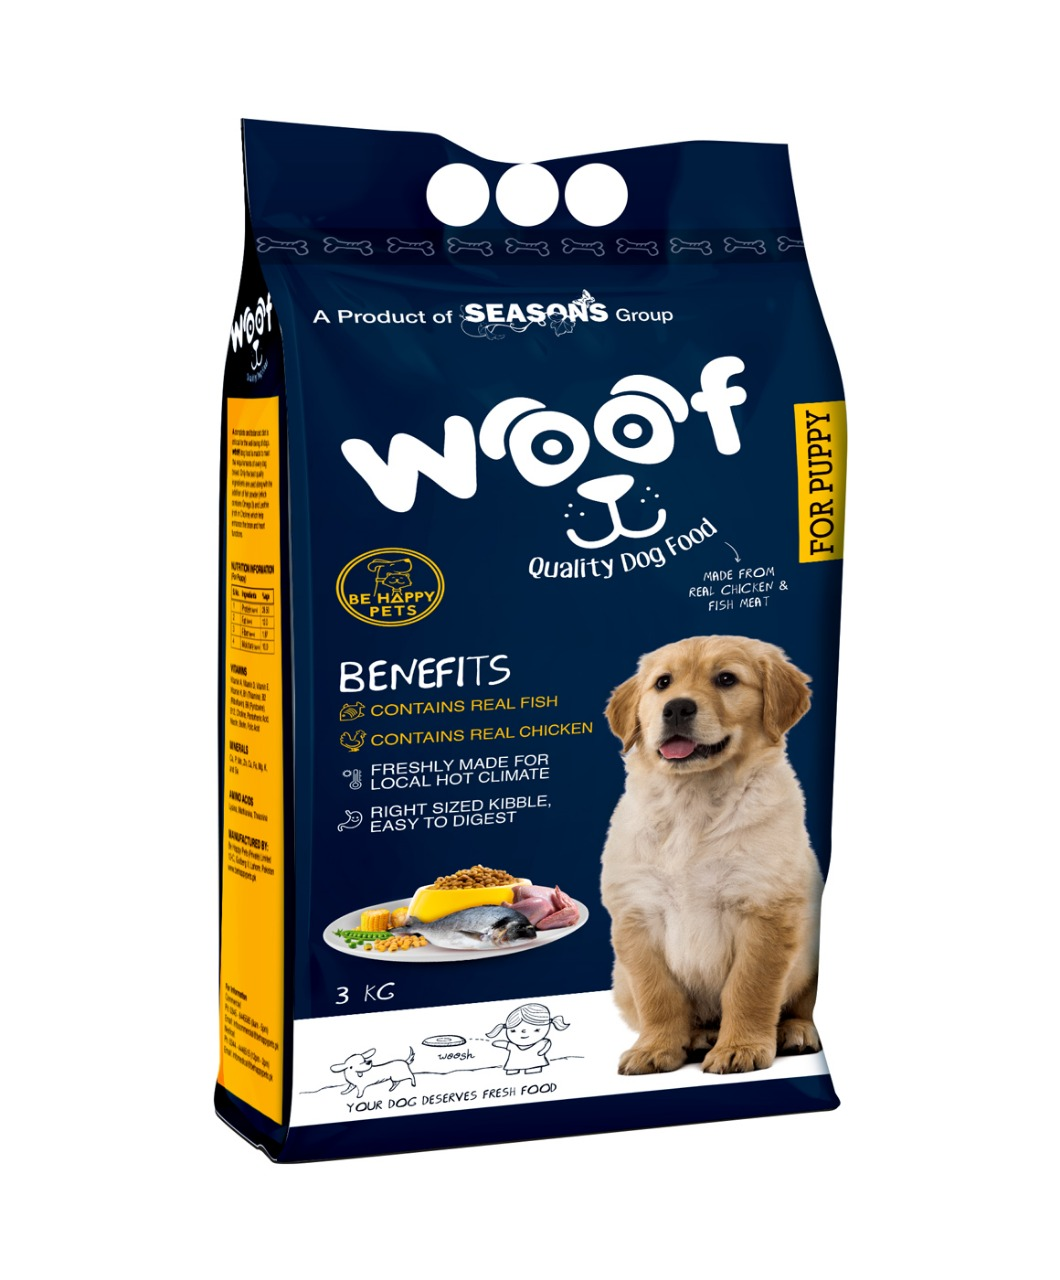 Woof Puppy Food - Pet Food - Pet Store - Pet supplies